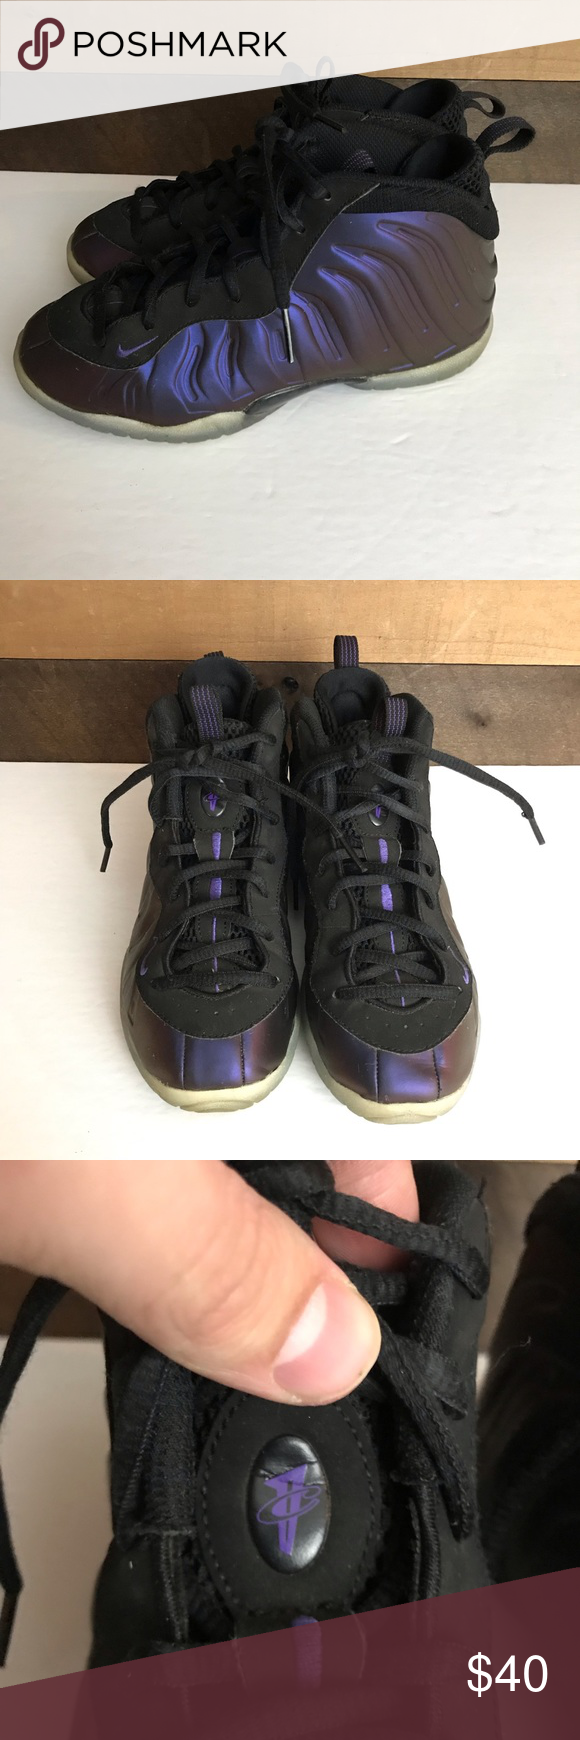 d8e6af205da50 Nike foamposite Purple eggplant penny youth 3y Nike Air Lil Posite  Foamposite One